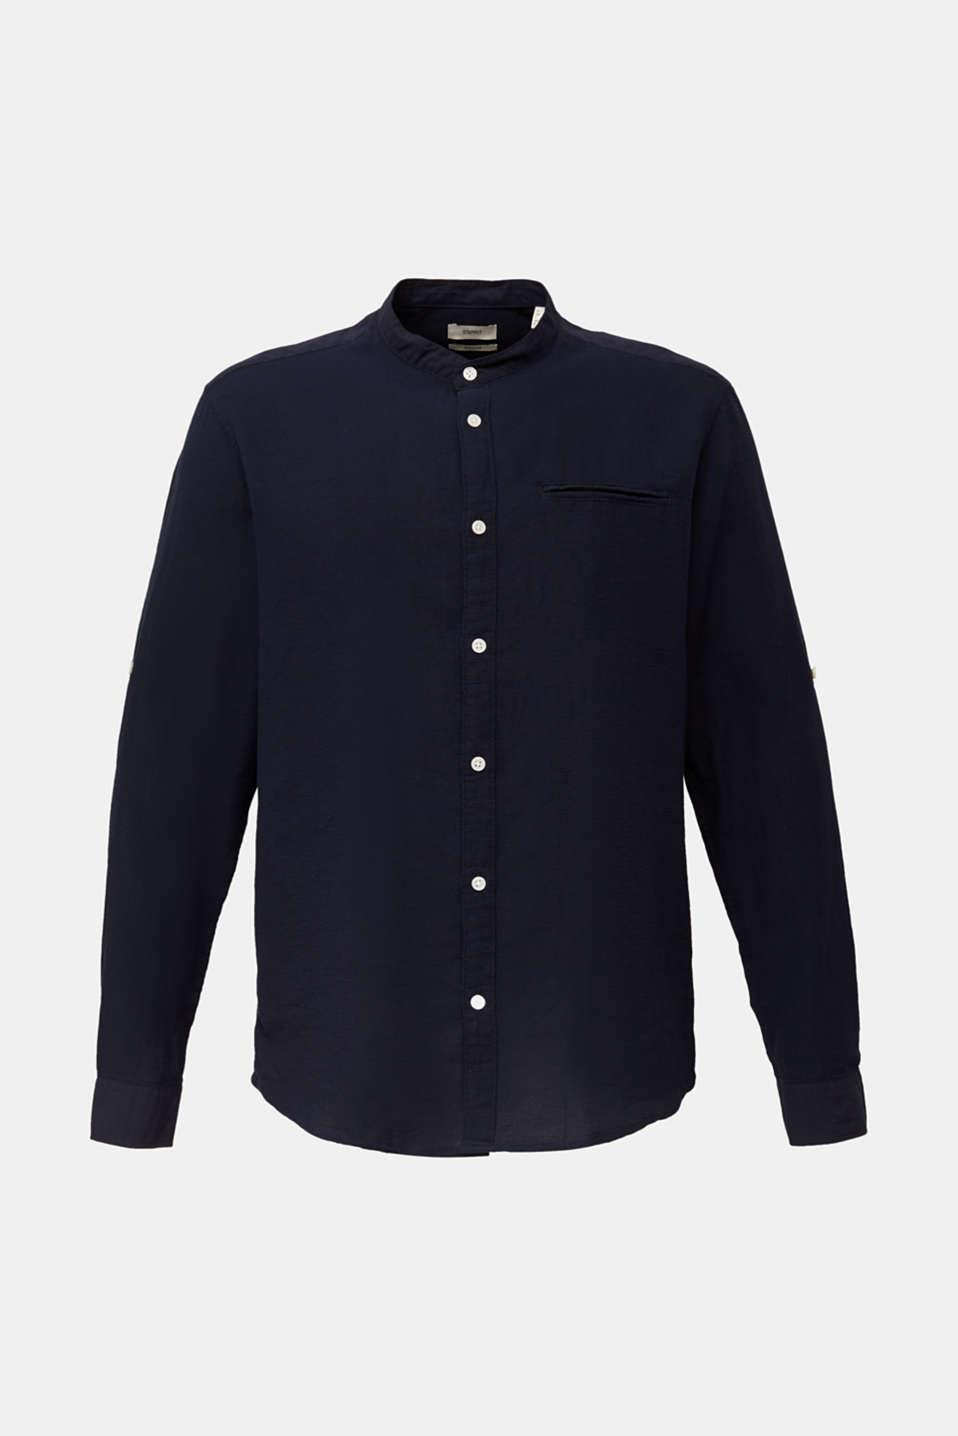 Textured shirt made of 100% organic, NAVY 5, detail image number 8